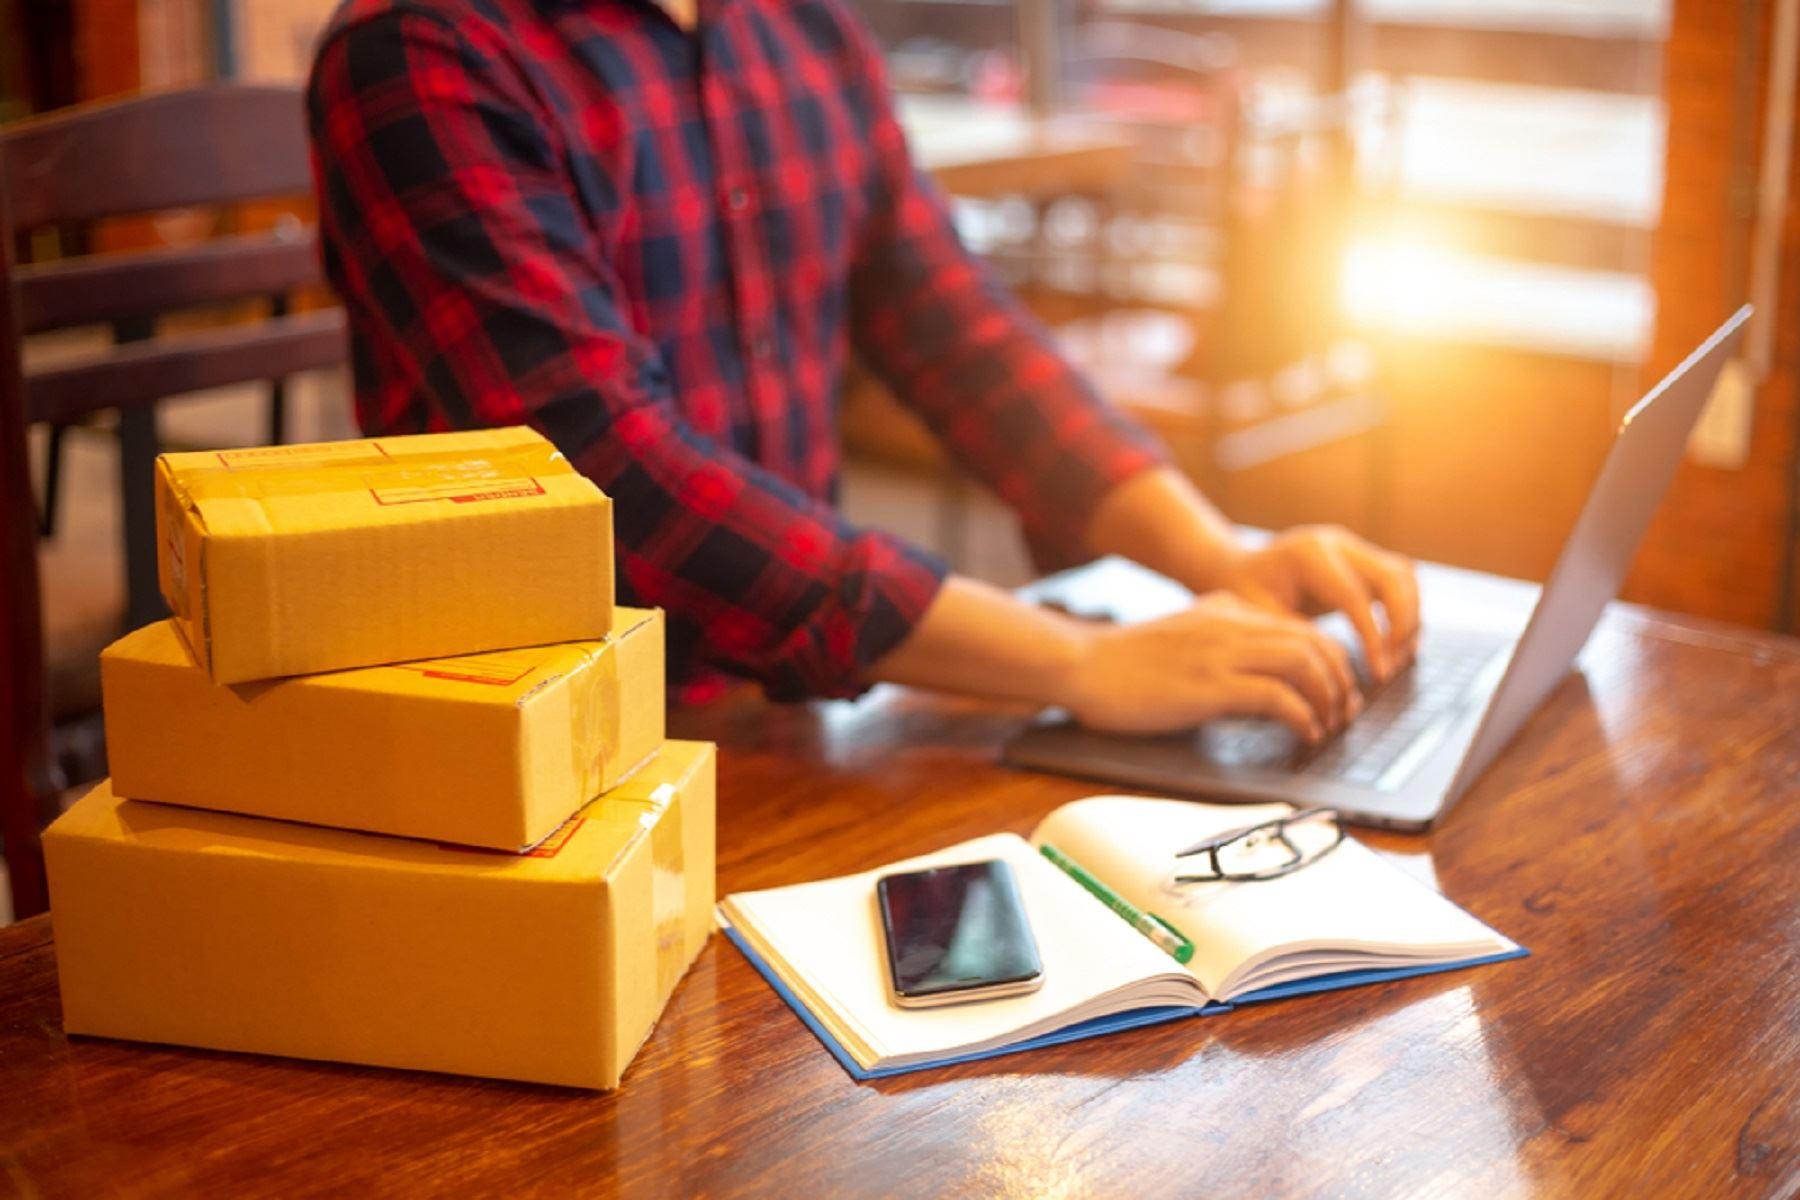 Sunat agiliza importación vía e-commerce